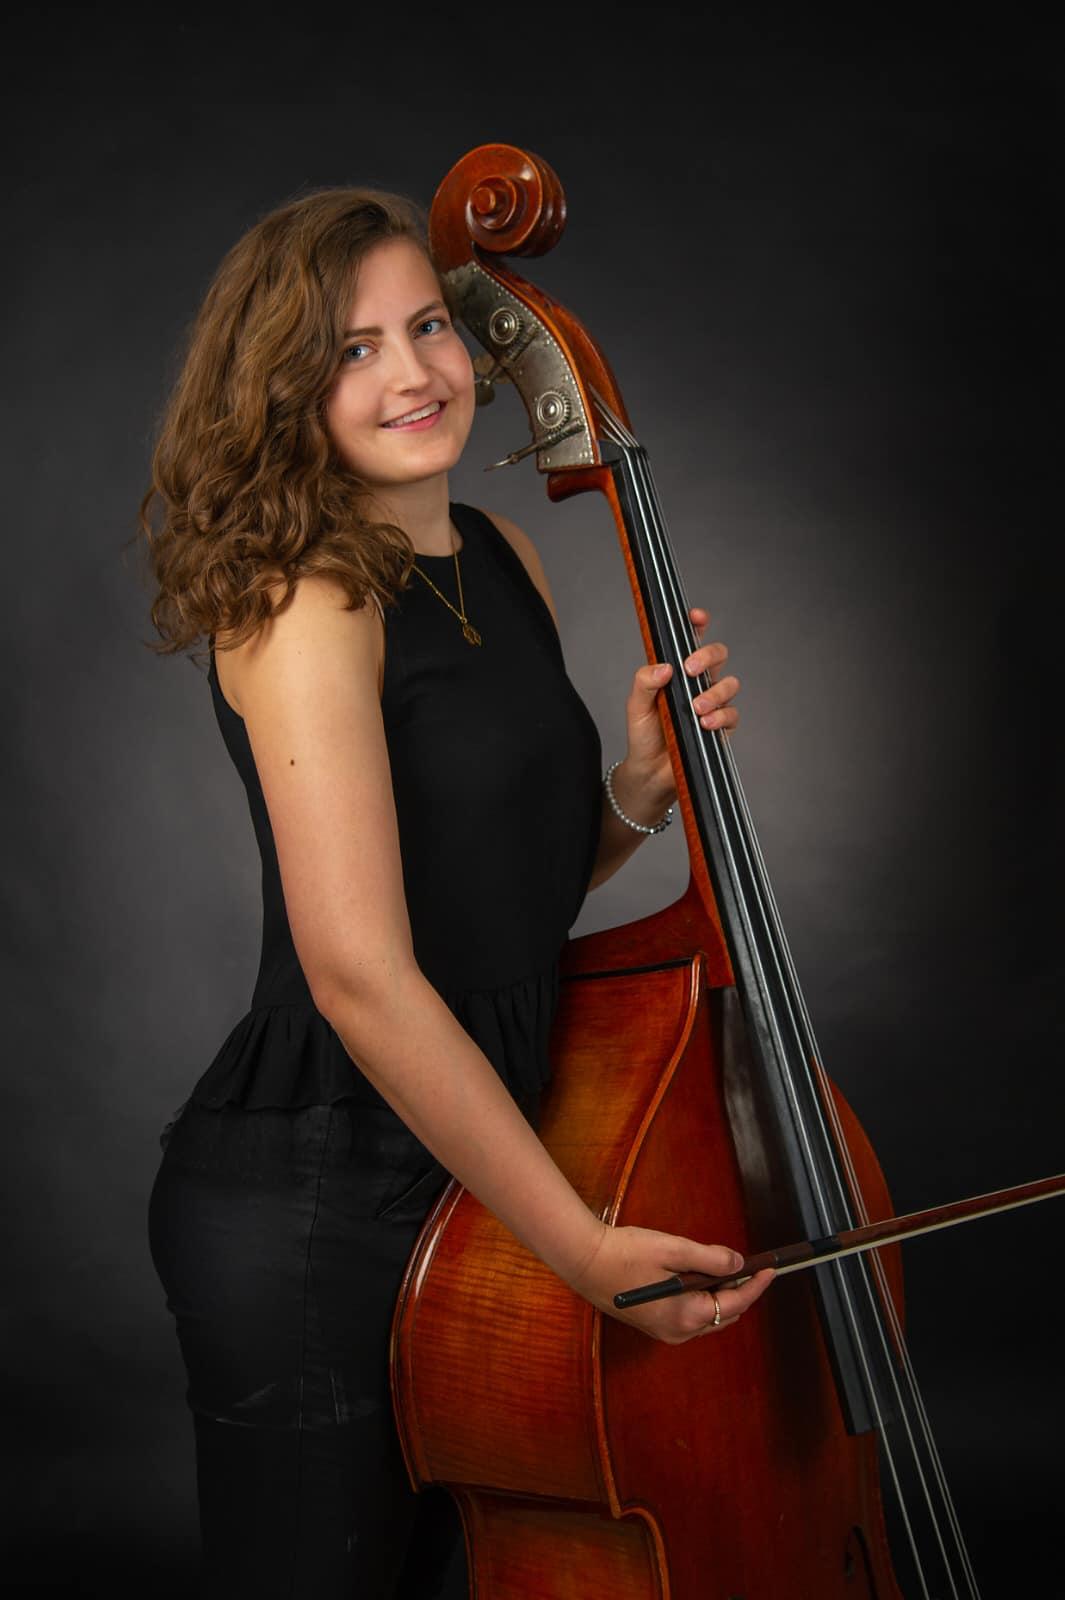 Anton-Brunner-Musikpreisträger 2021: Leah Schießl